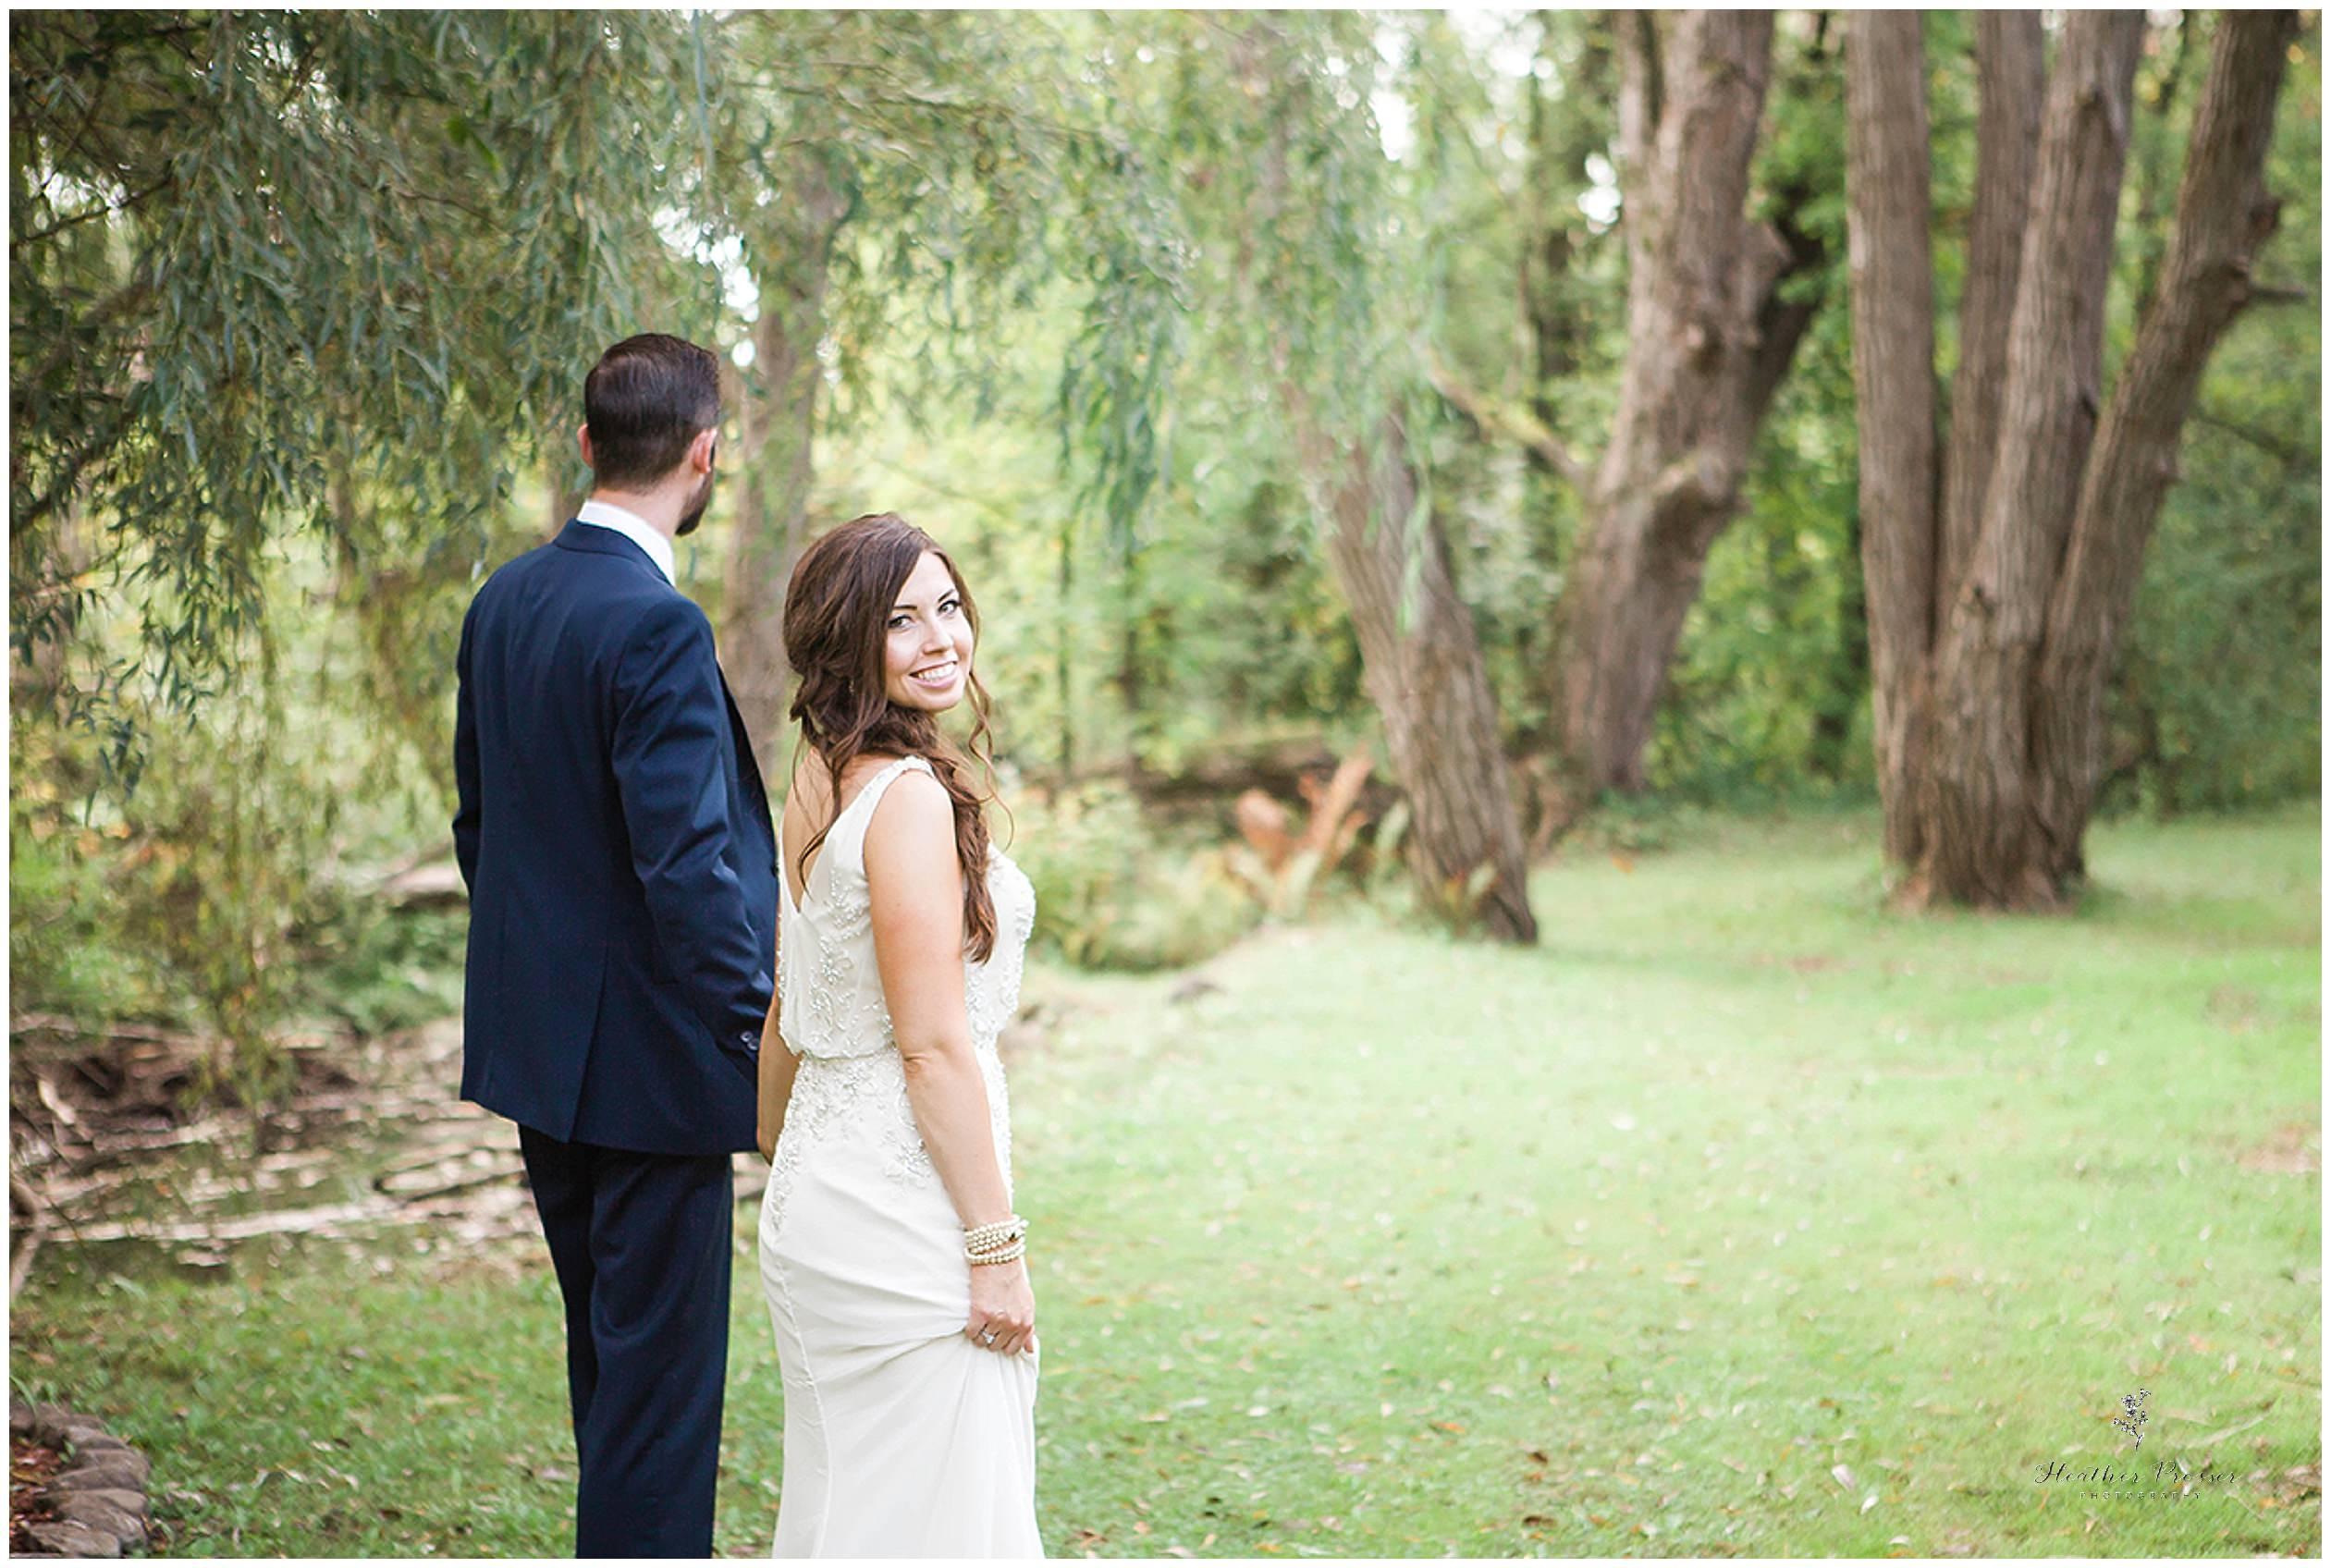 Bowmanville Wedding Photography_0220.jpg